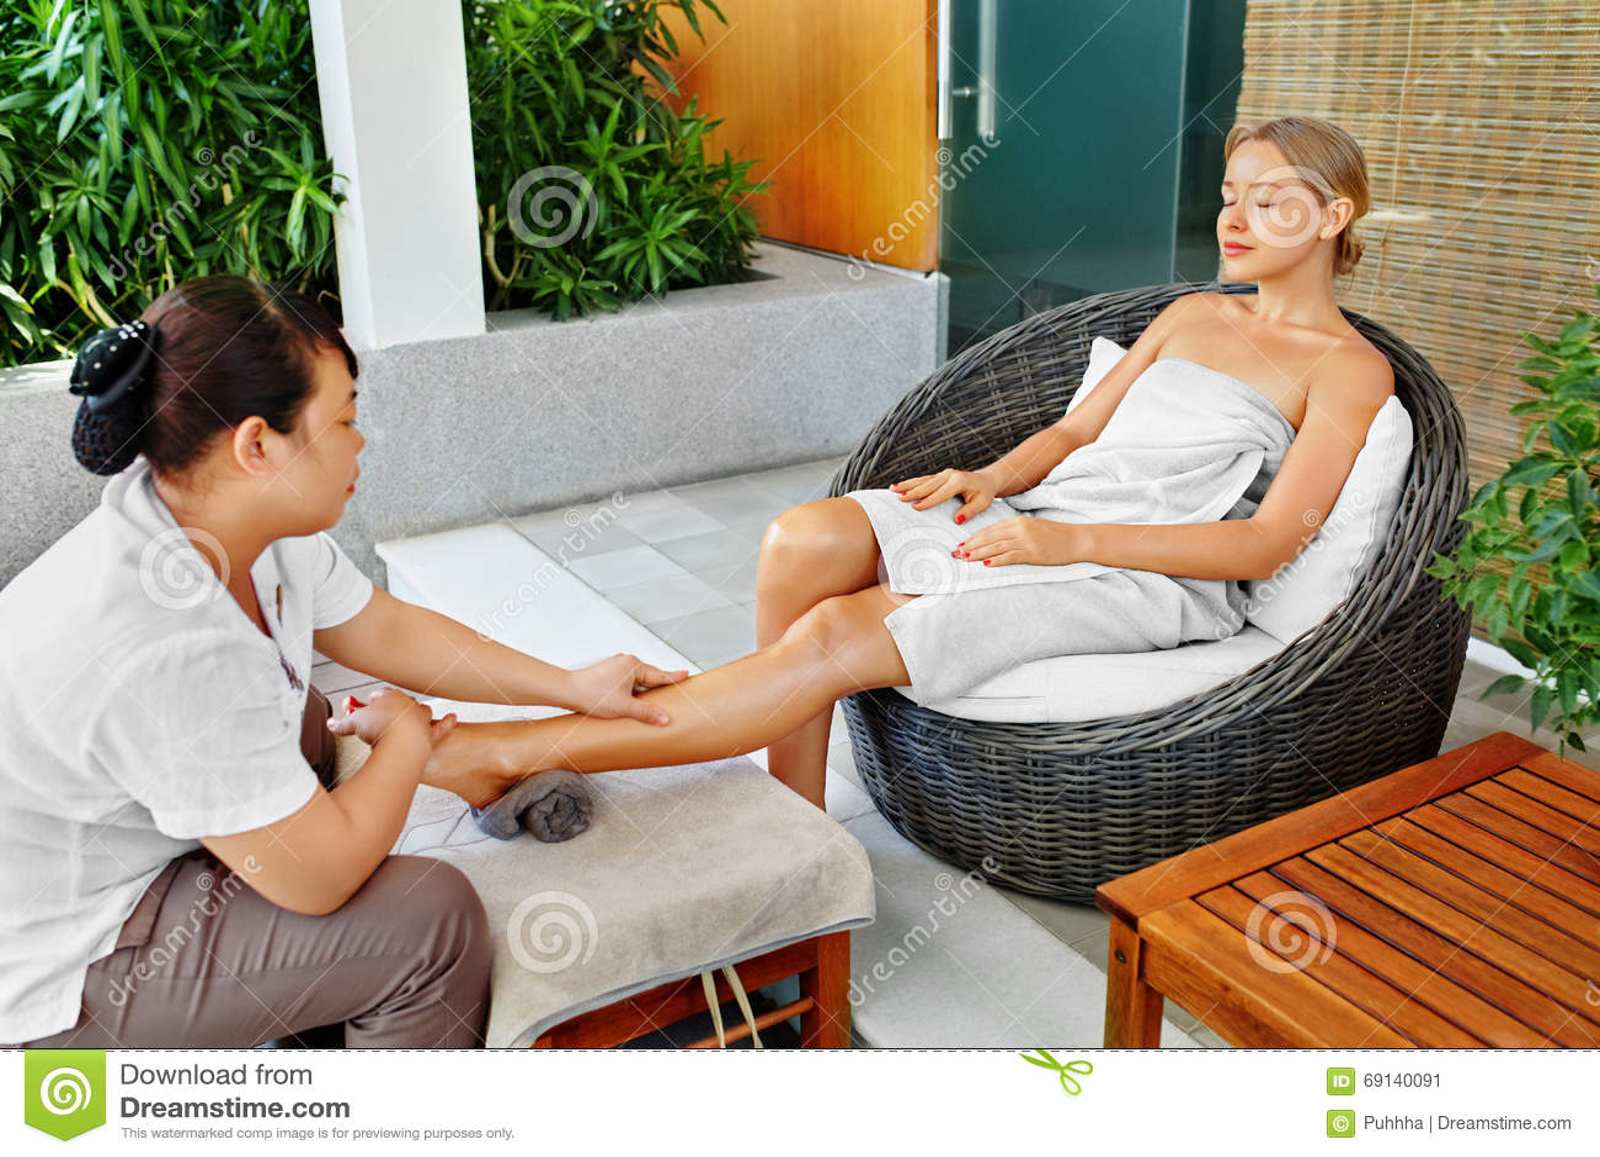 Aromatherapy Foot Spa